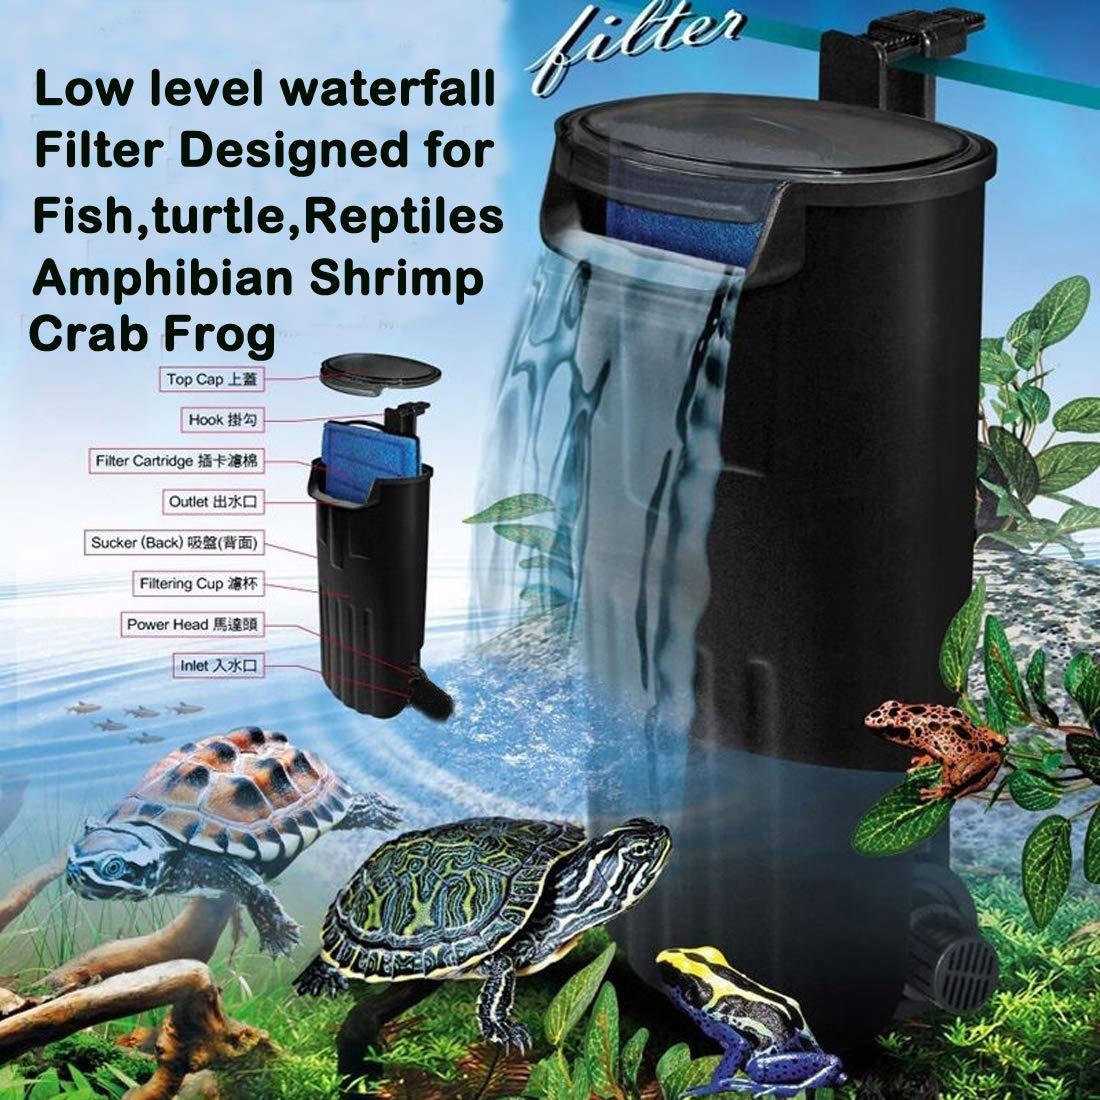 Aquarium Turtle Filter, Quiet flow Water Clean Pump Bio Filtration for Reptiles tank Low Level Waterfall Filter for Small Fish Tank Turtle Tank Shrimp Tank Amphibian Frog Crab (600L/H Aquarium filter) by JackSuper